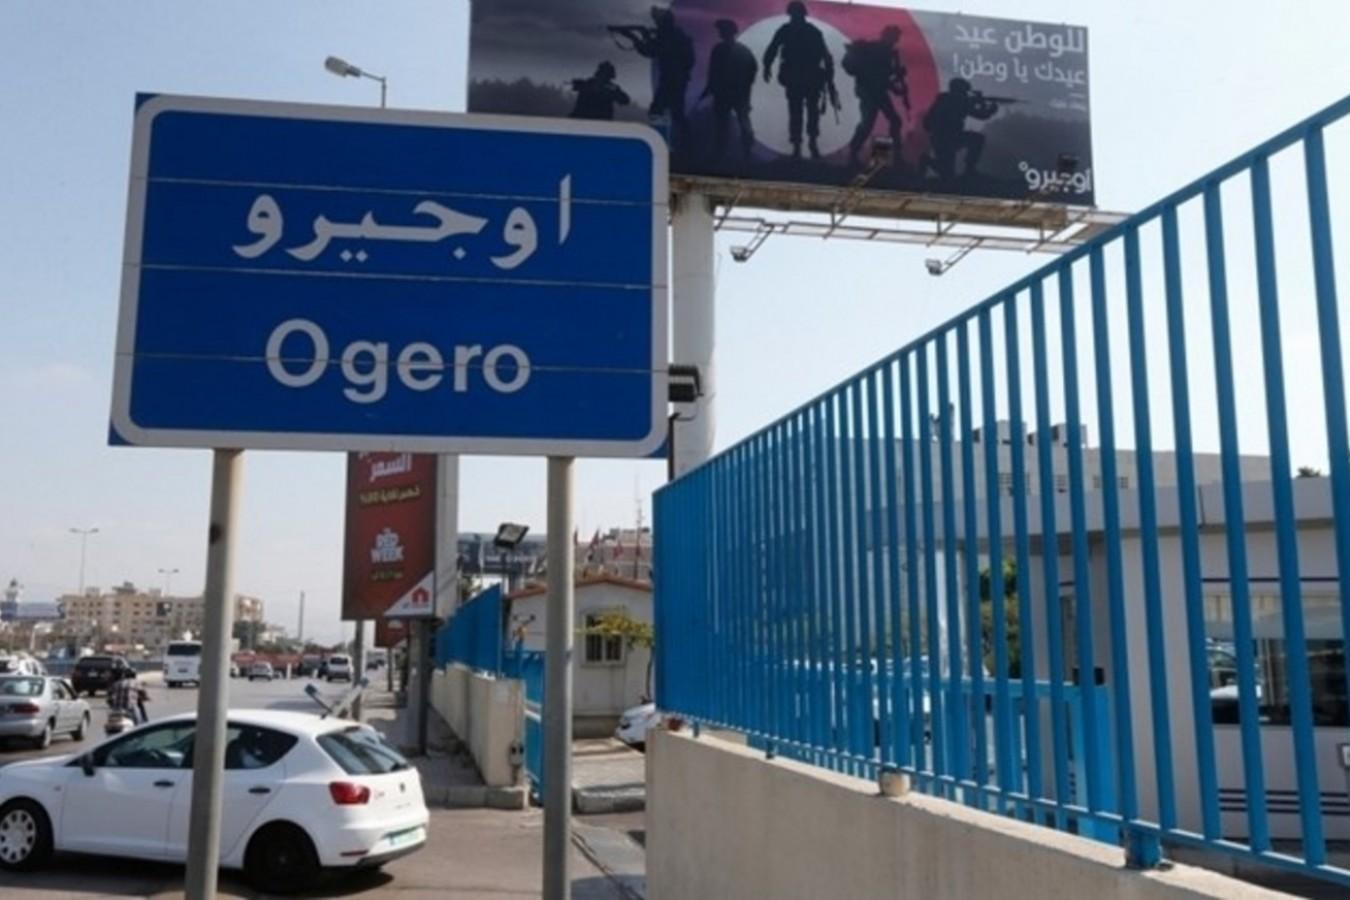 Ogero shows off superfast internet in Bshamoun